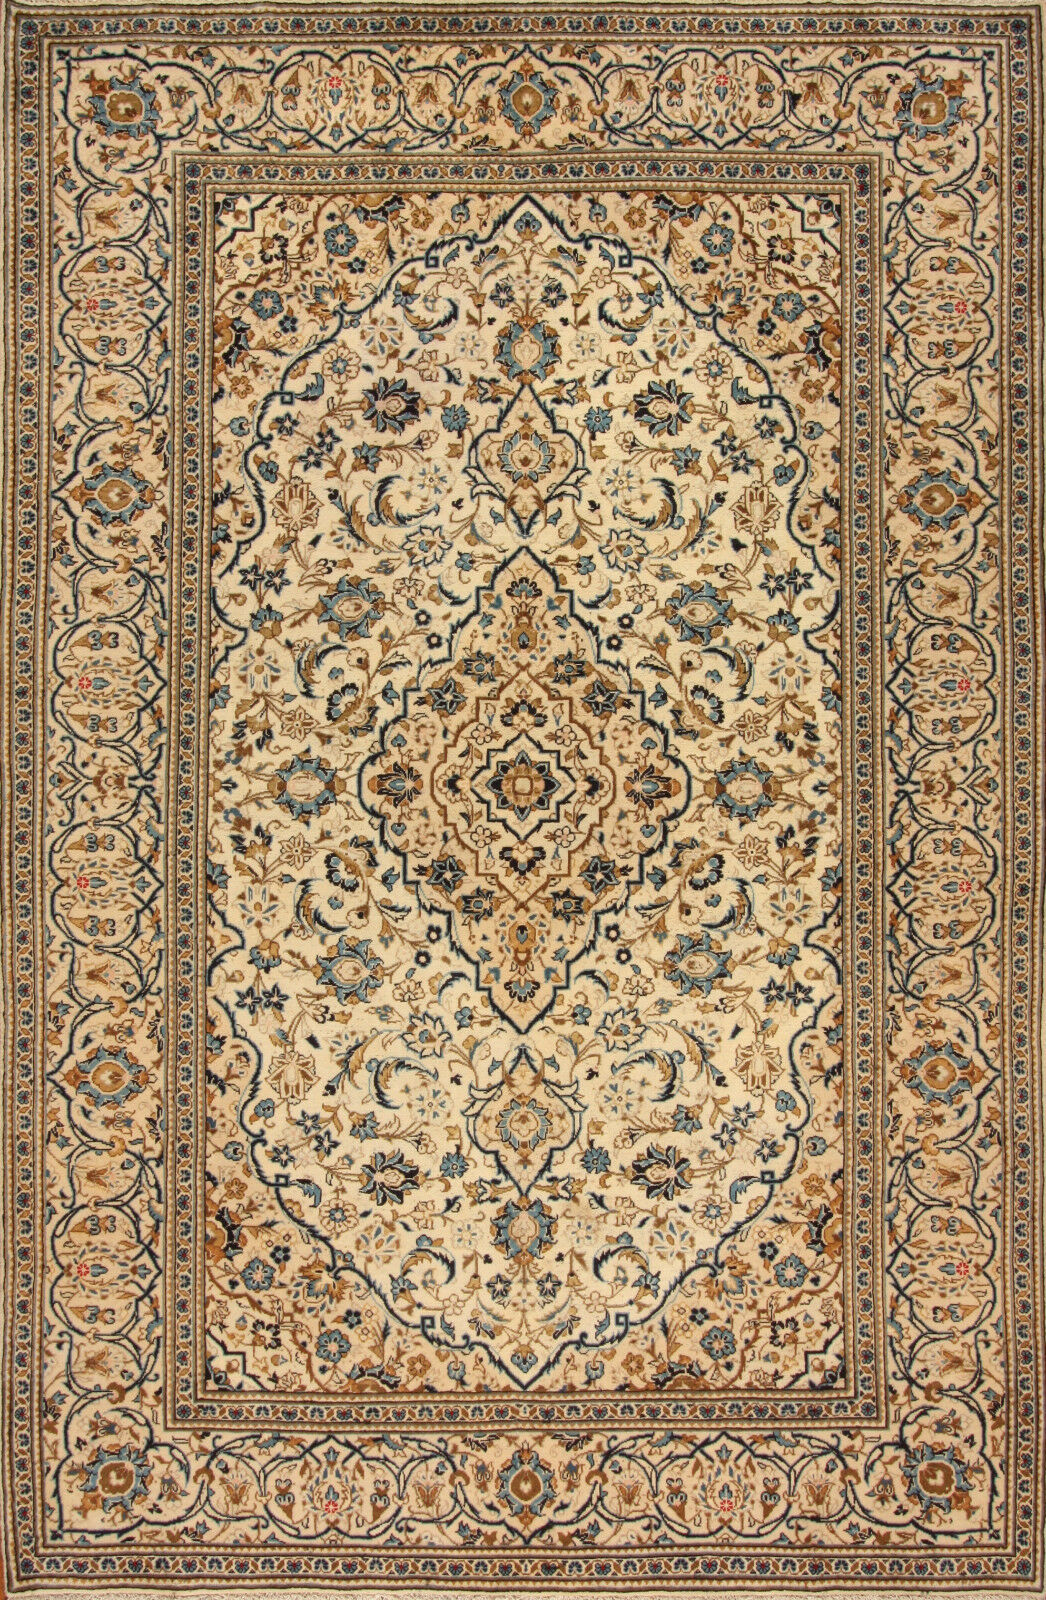 TAPPETO Orientale Vero Annodato Tapis persan n. 4457 (303 x 200) cm